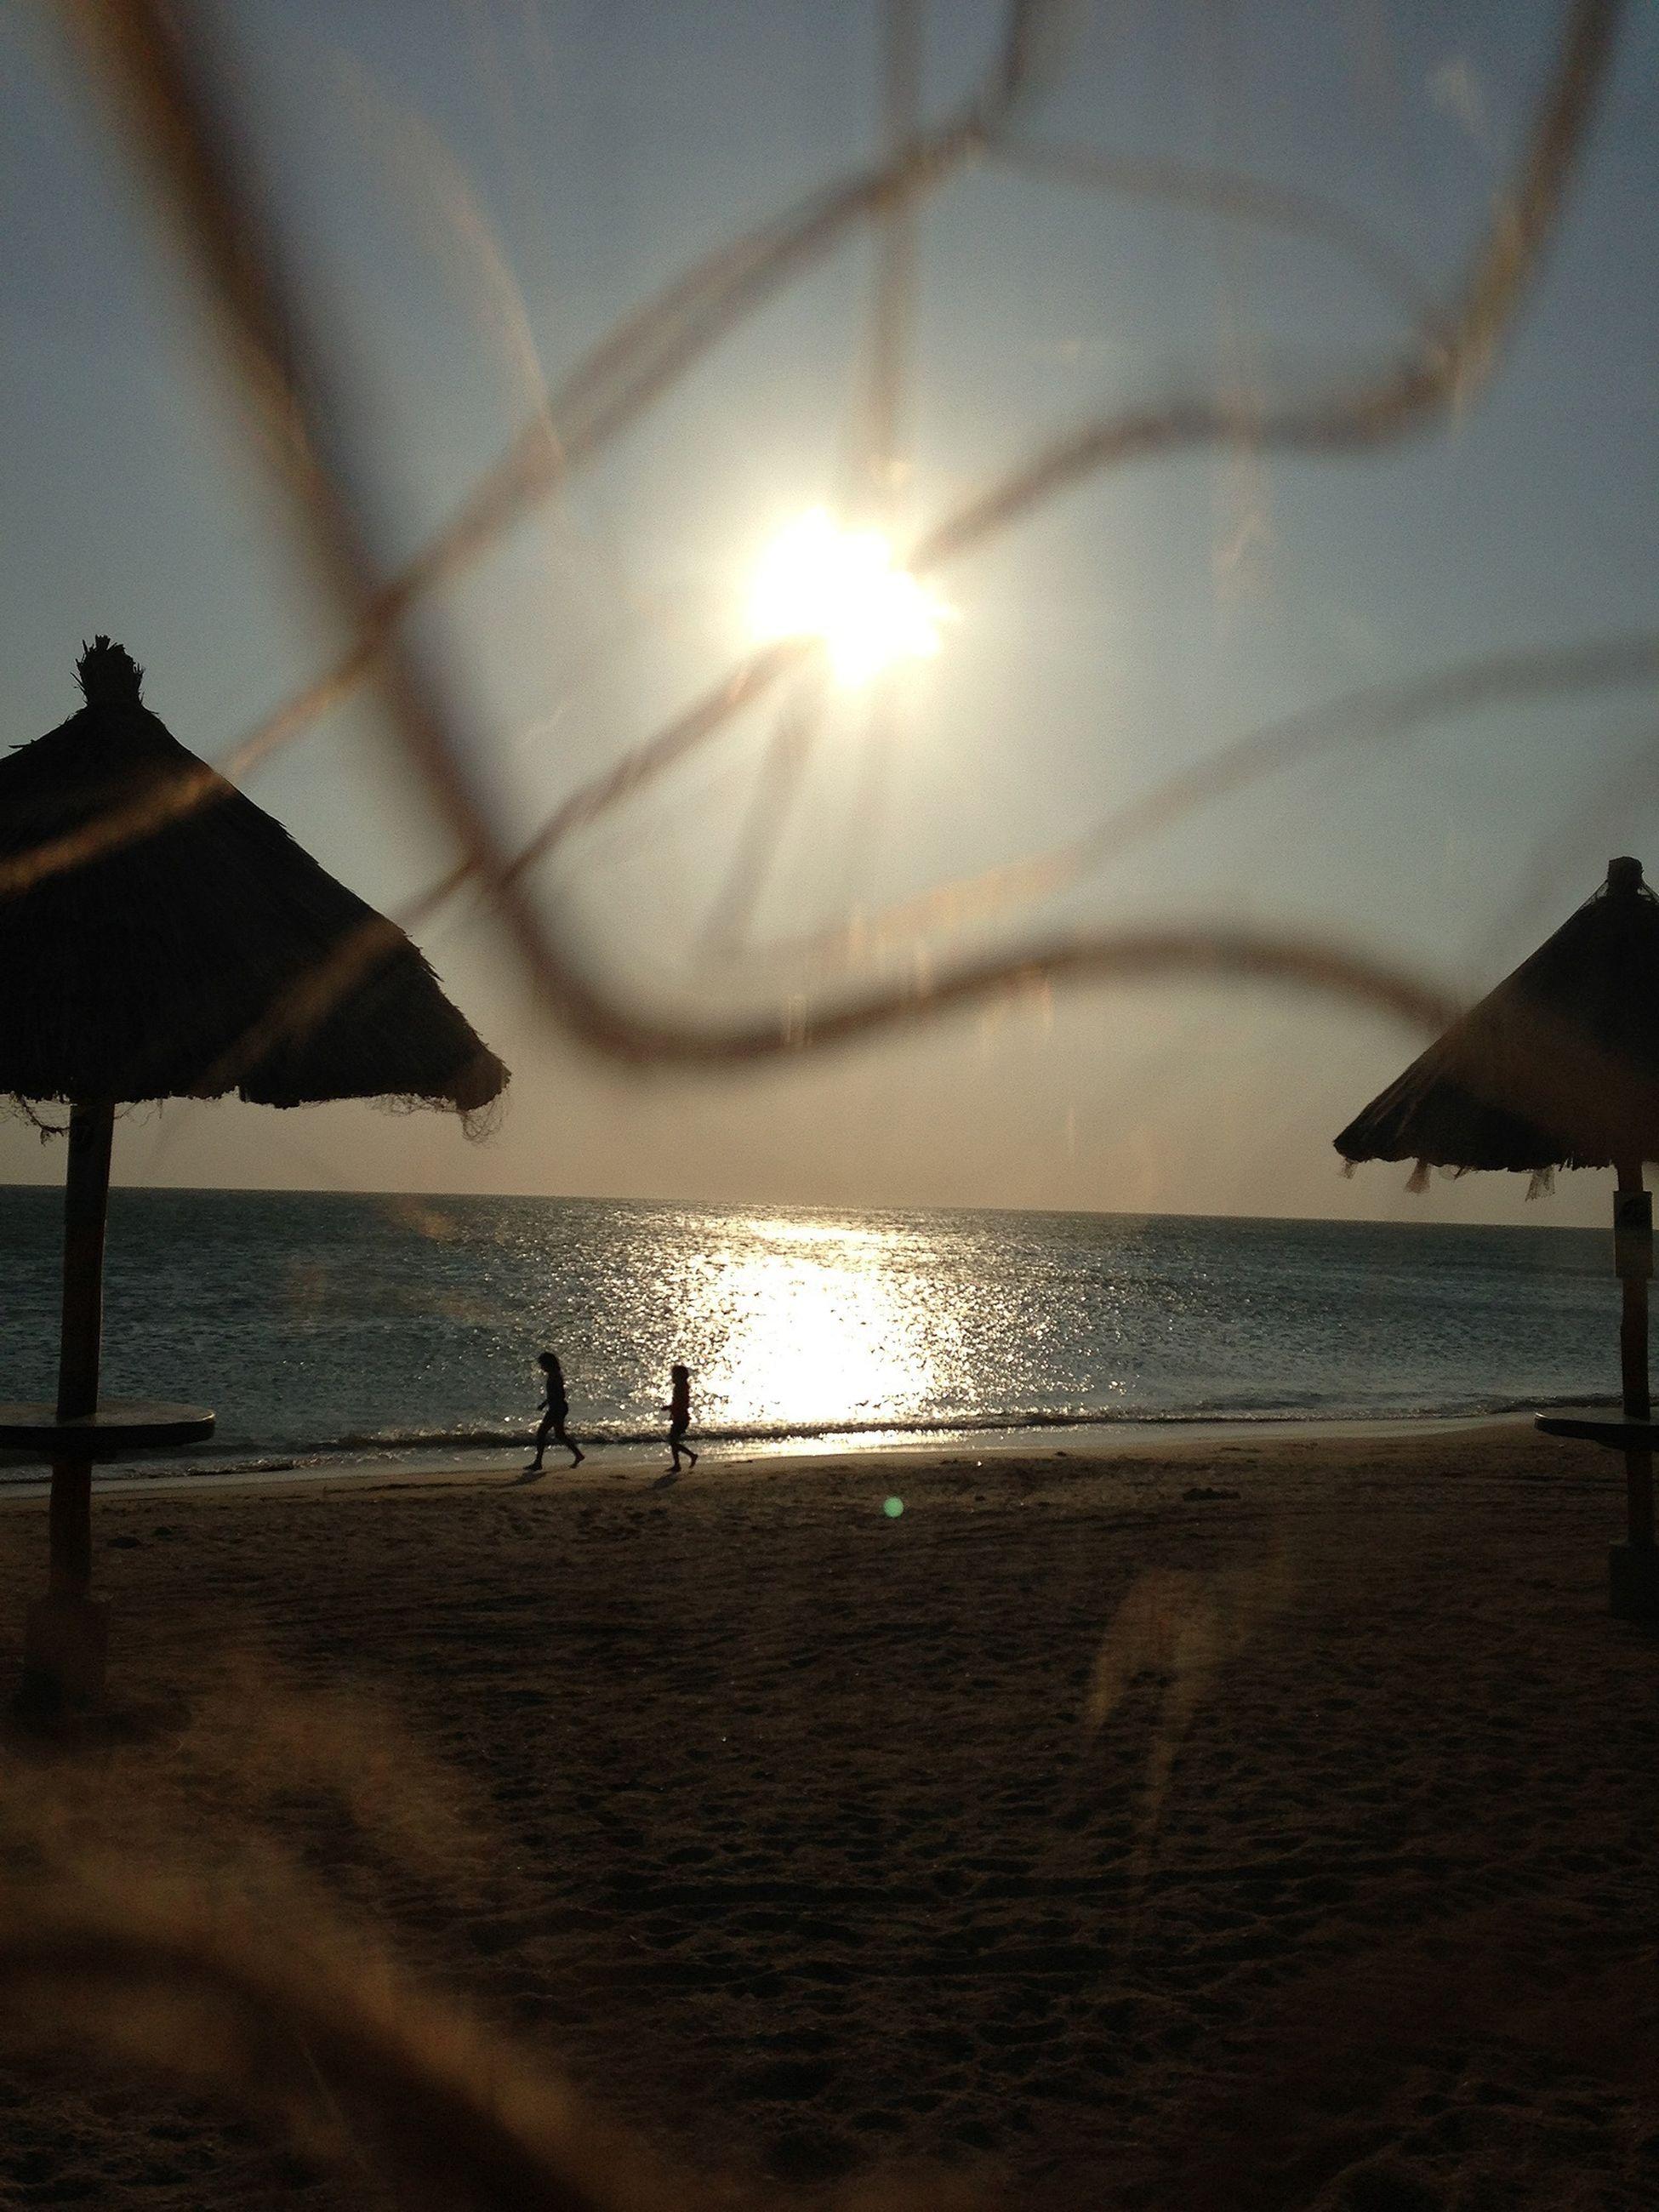 sea, horizon over water, beach, water, sun, shore, tranquil scene, scenics, tranquility, sky, sand, beauty in nature, sunlight, sunset, nature, idyllic, silhouette, sunbeam, reflection, vacations